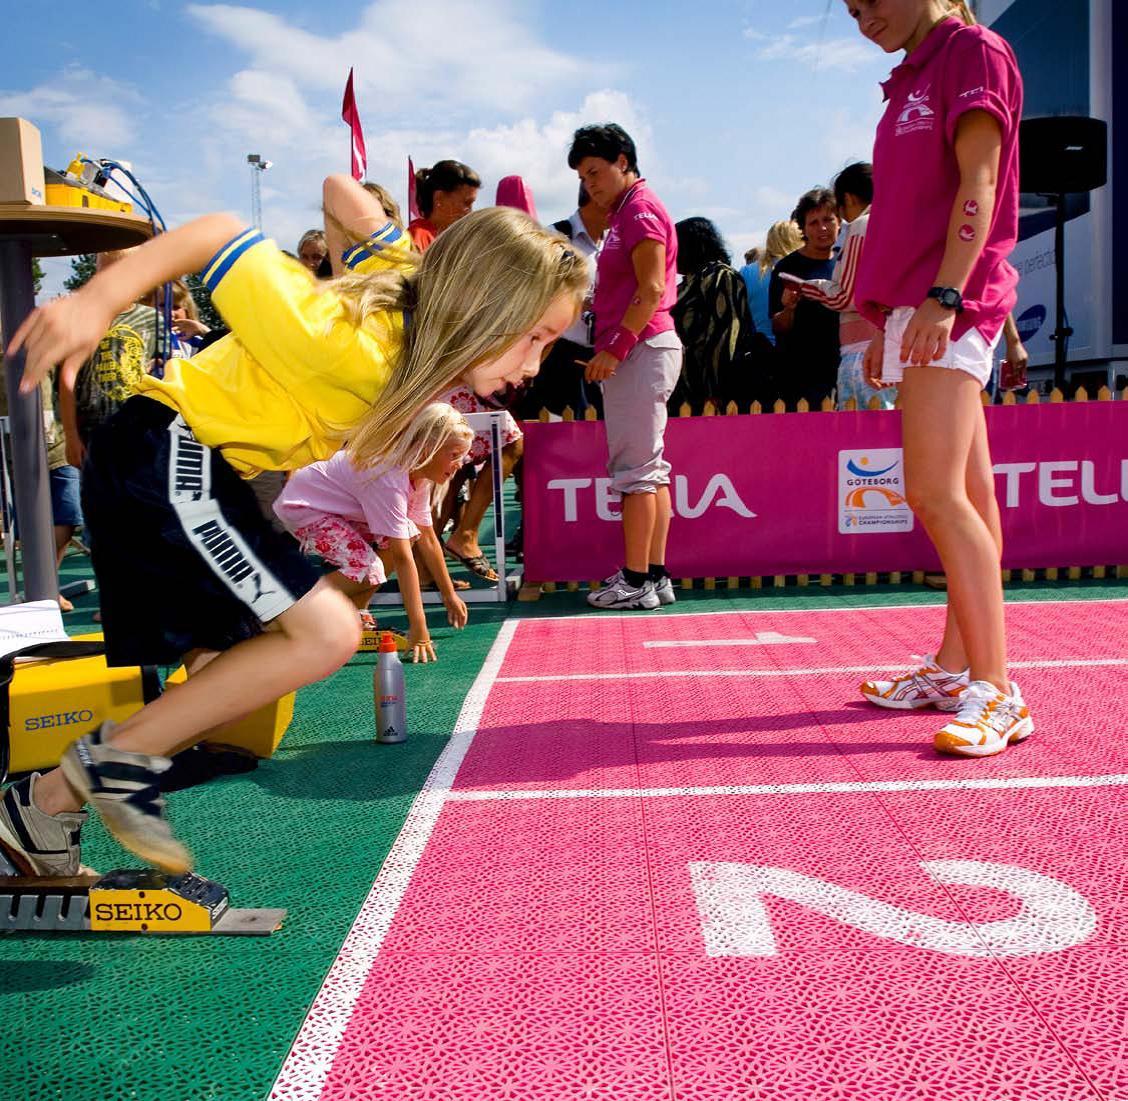 multisportunderlag underlag mulitsport unisport